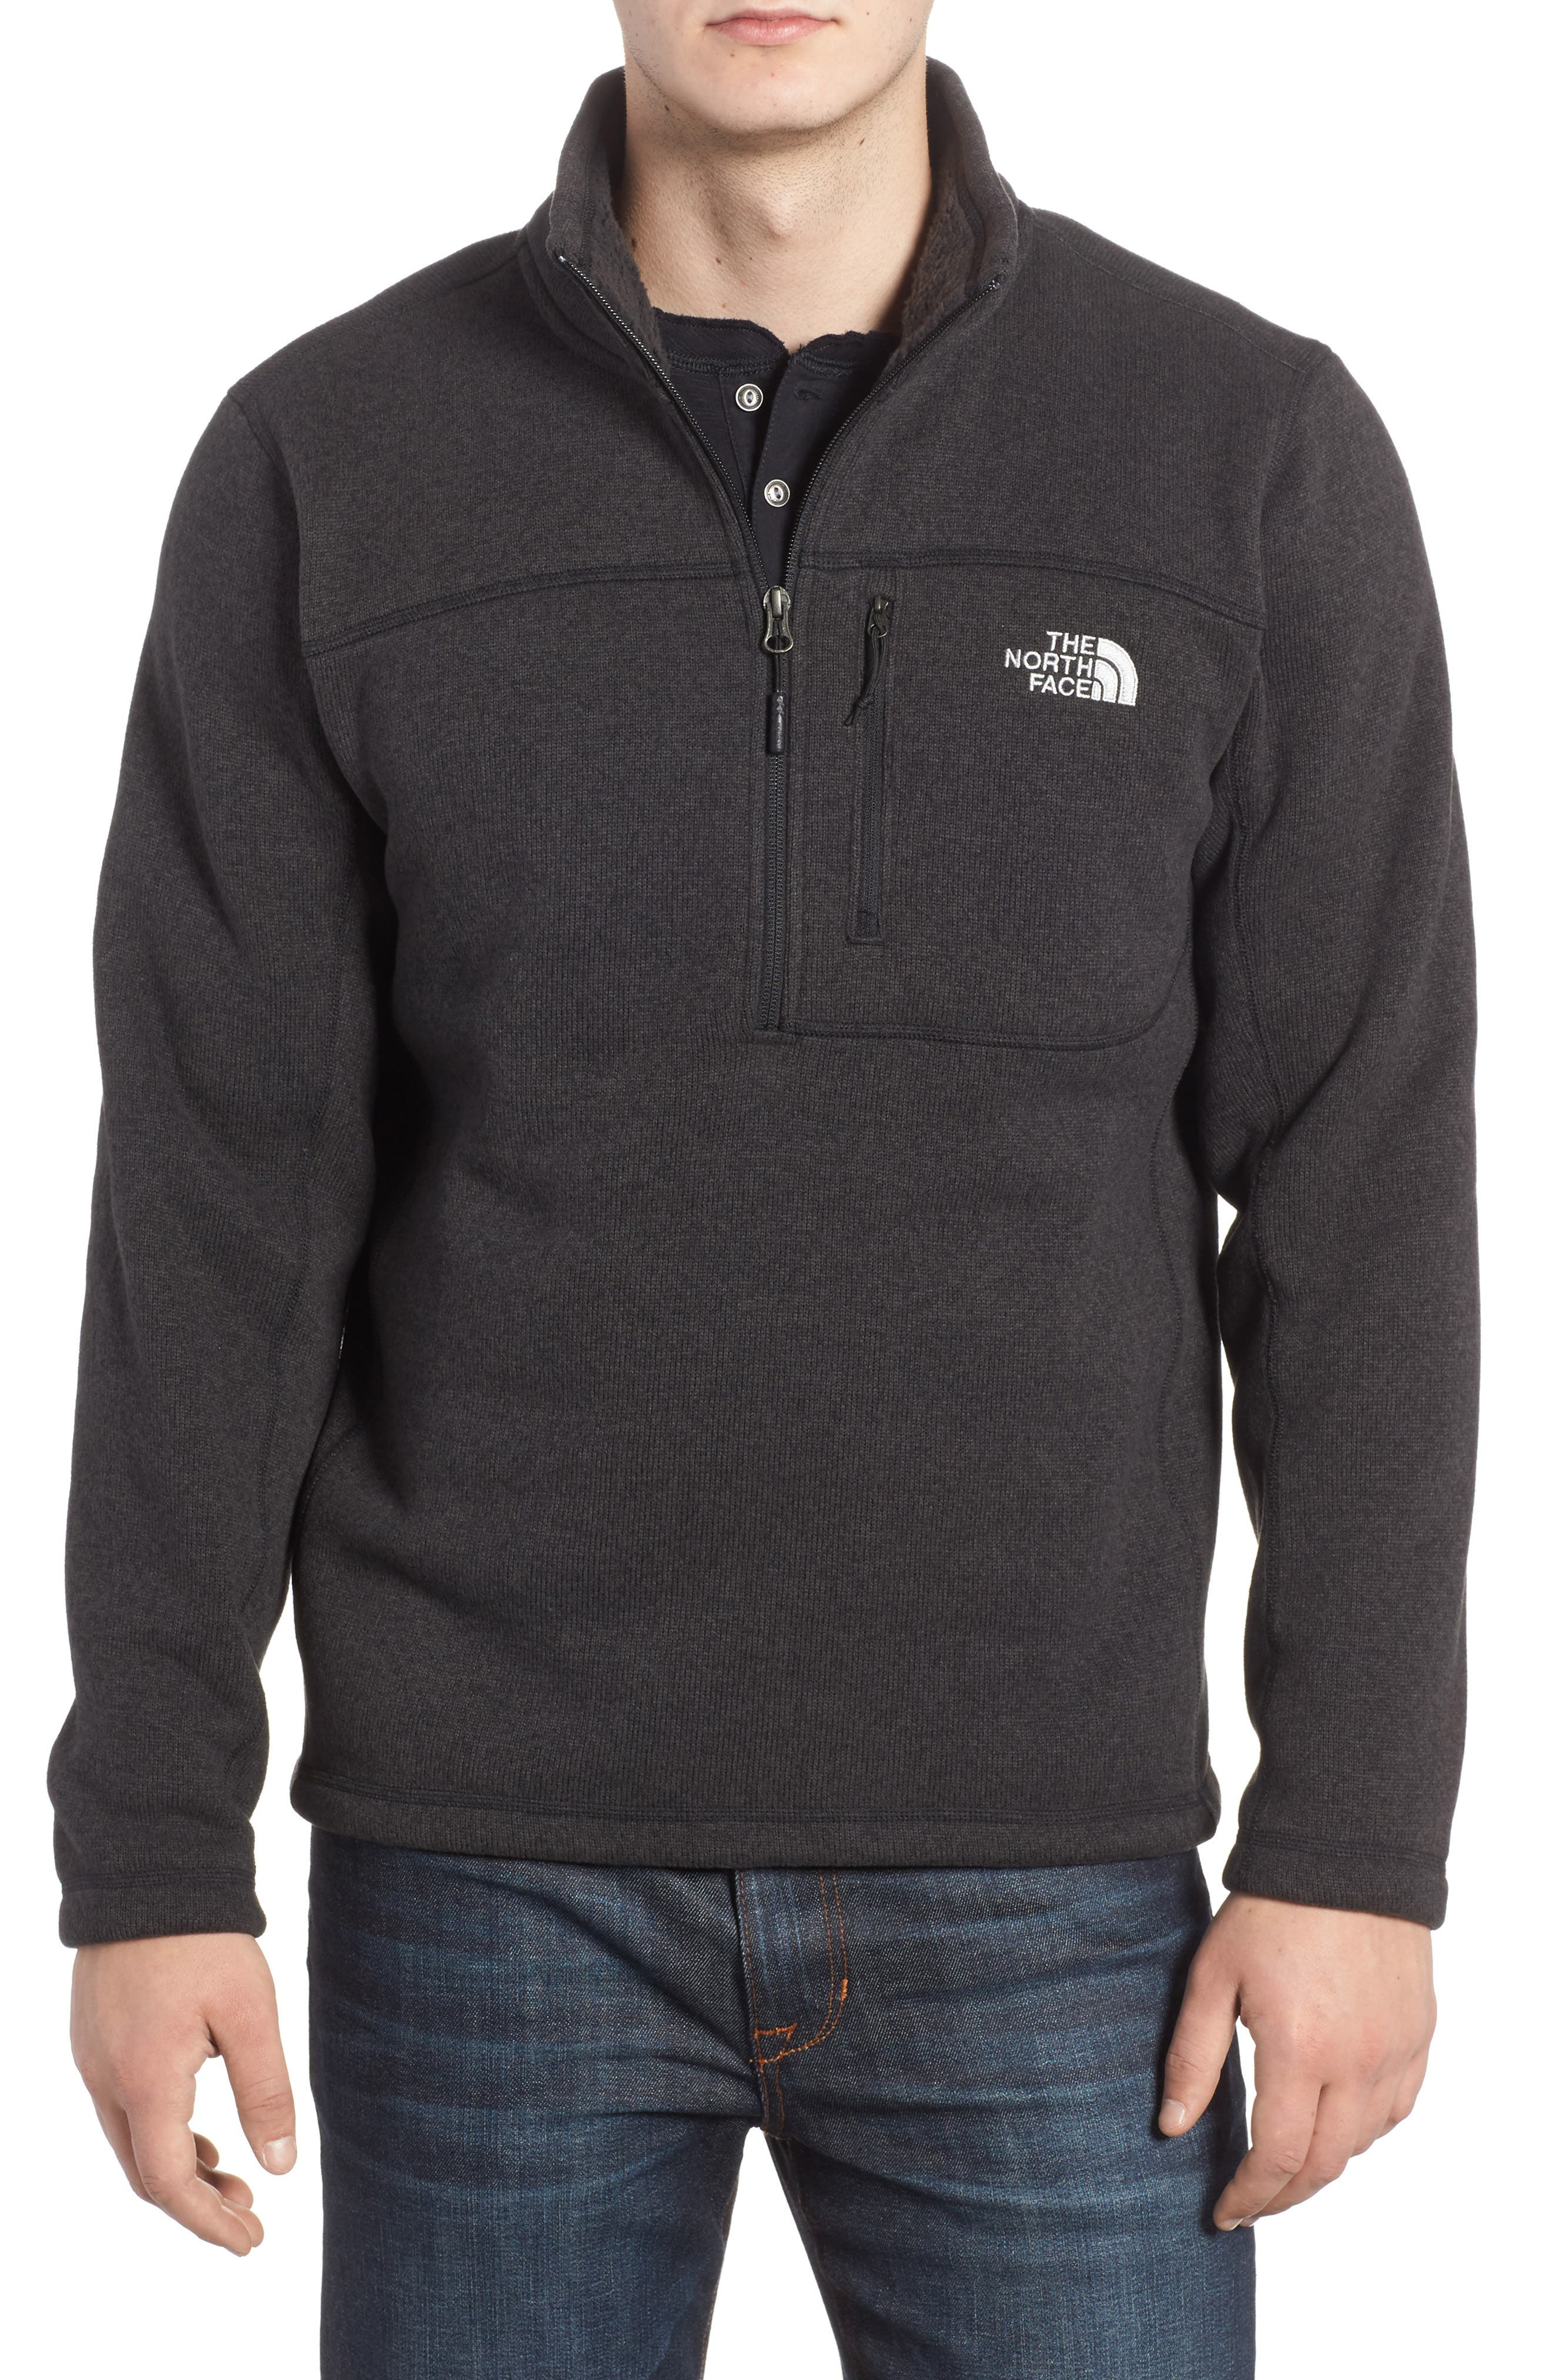 THE NORTH FACE Gordon Lyons Quarter-Zip Fleece Jacket, Main, color, 001